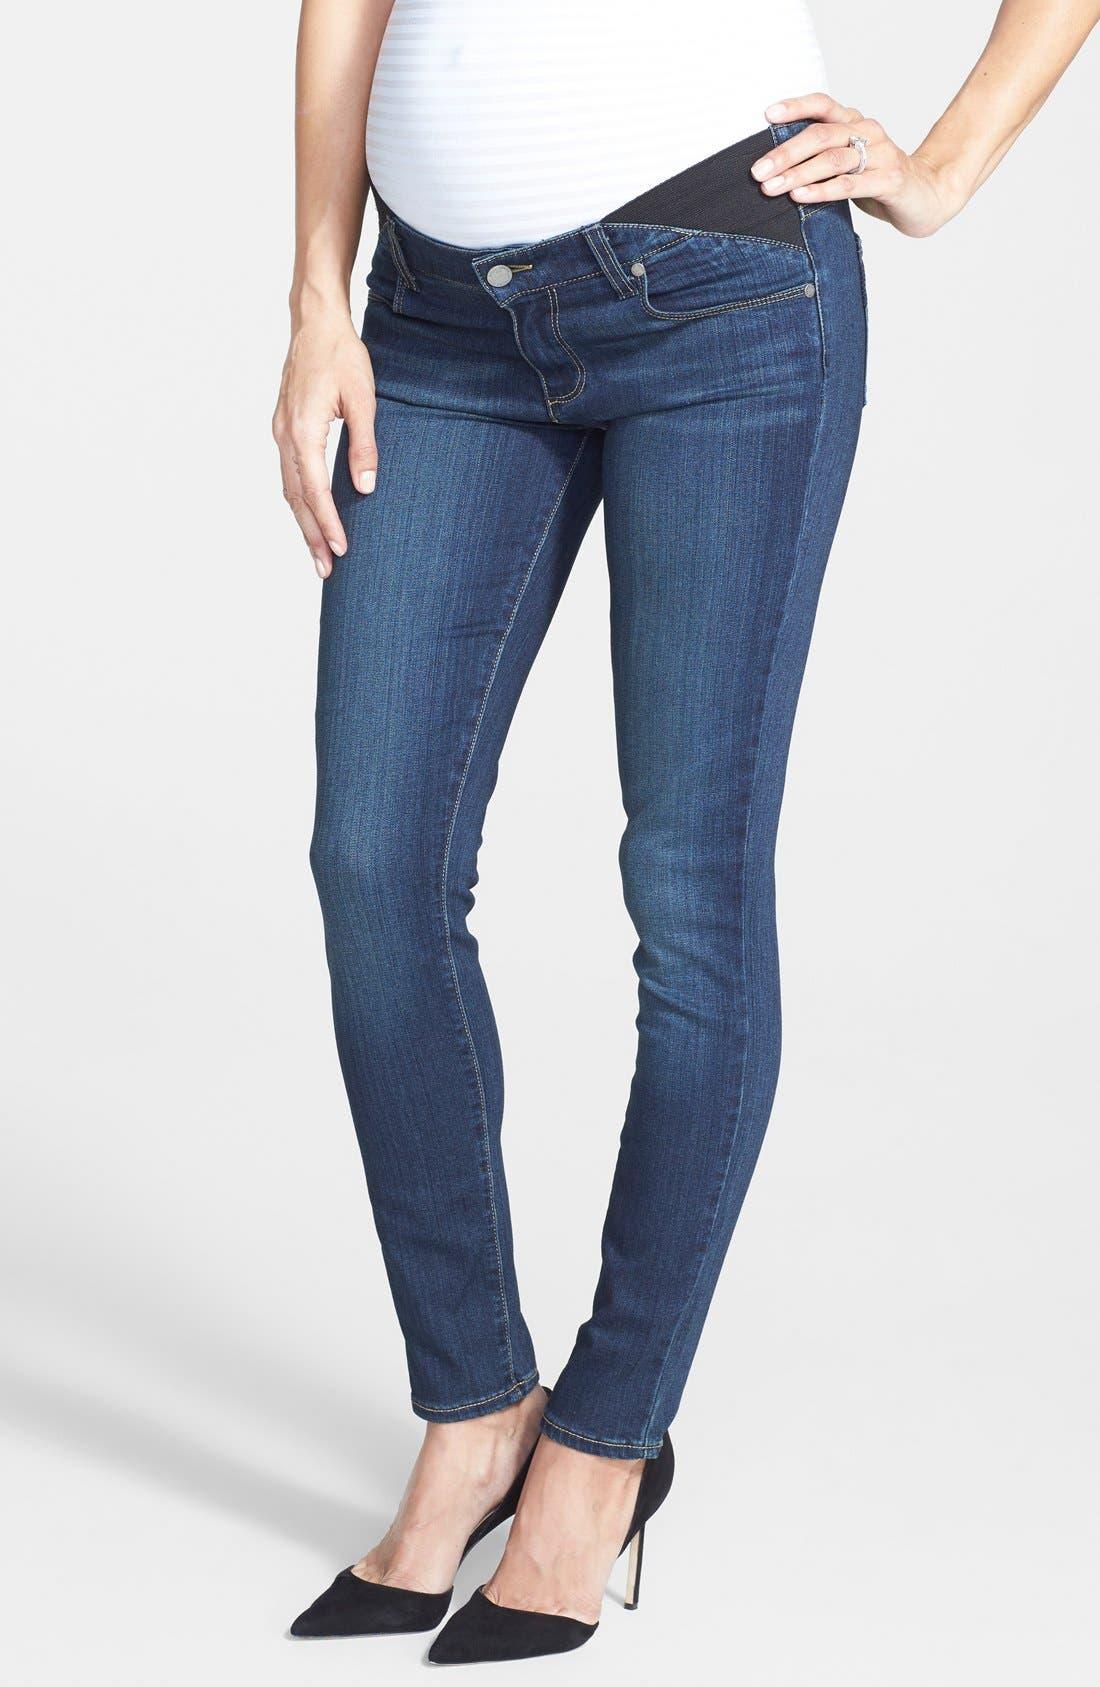 Main Image - Paige Denim 'Transcend - Verdugo' Maternity Jeans (Nottingham)